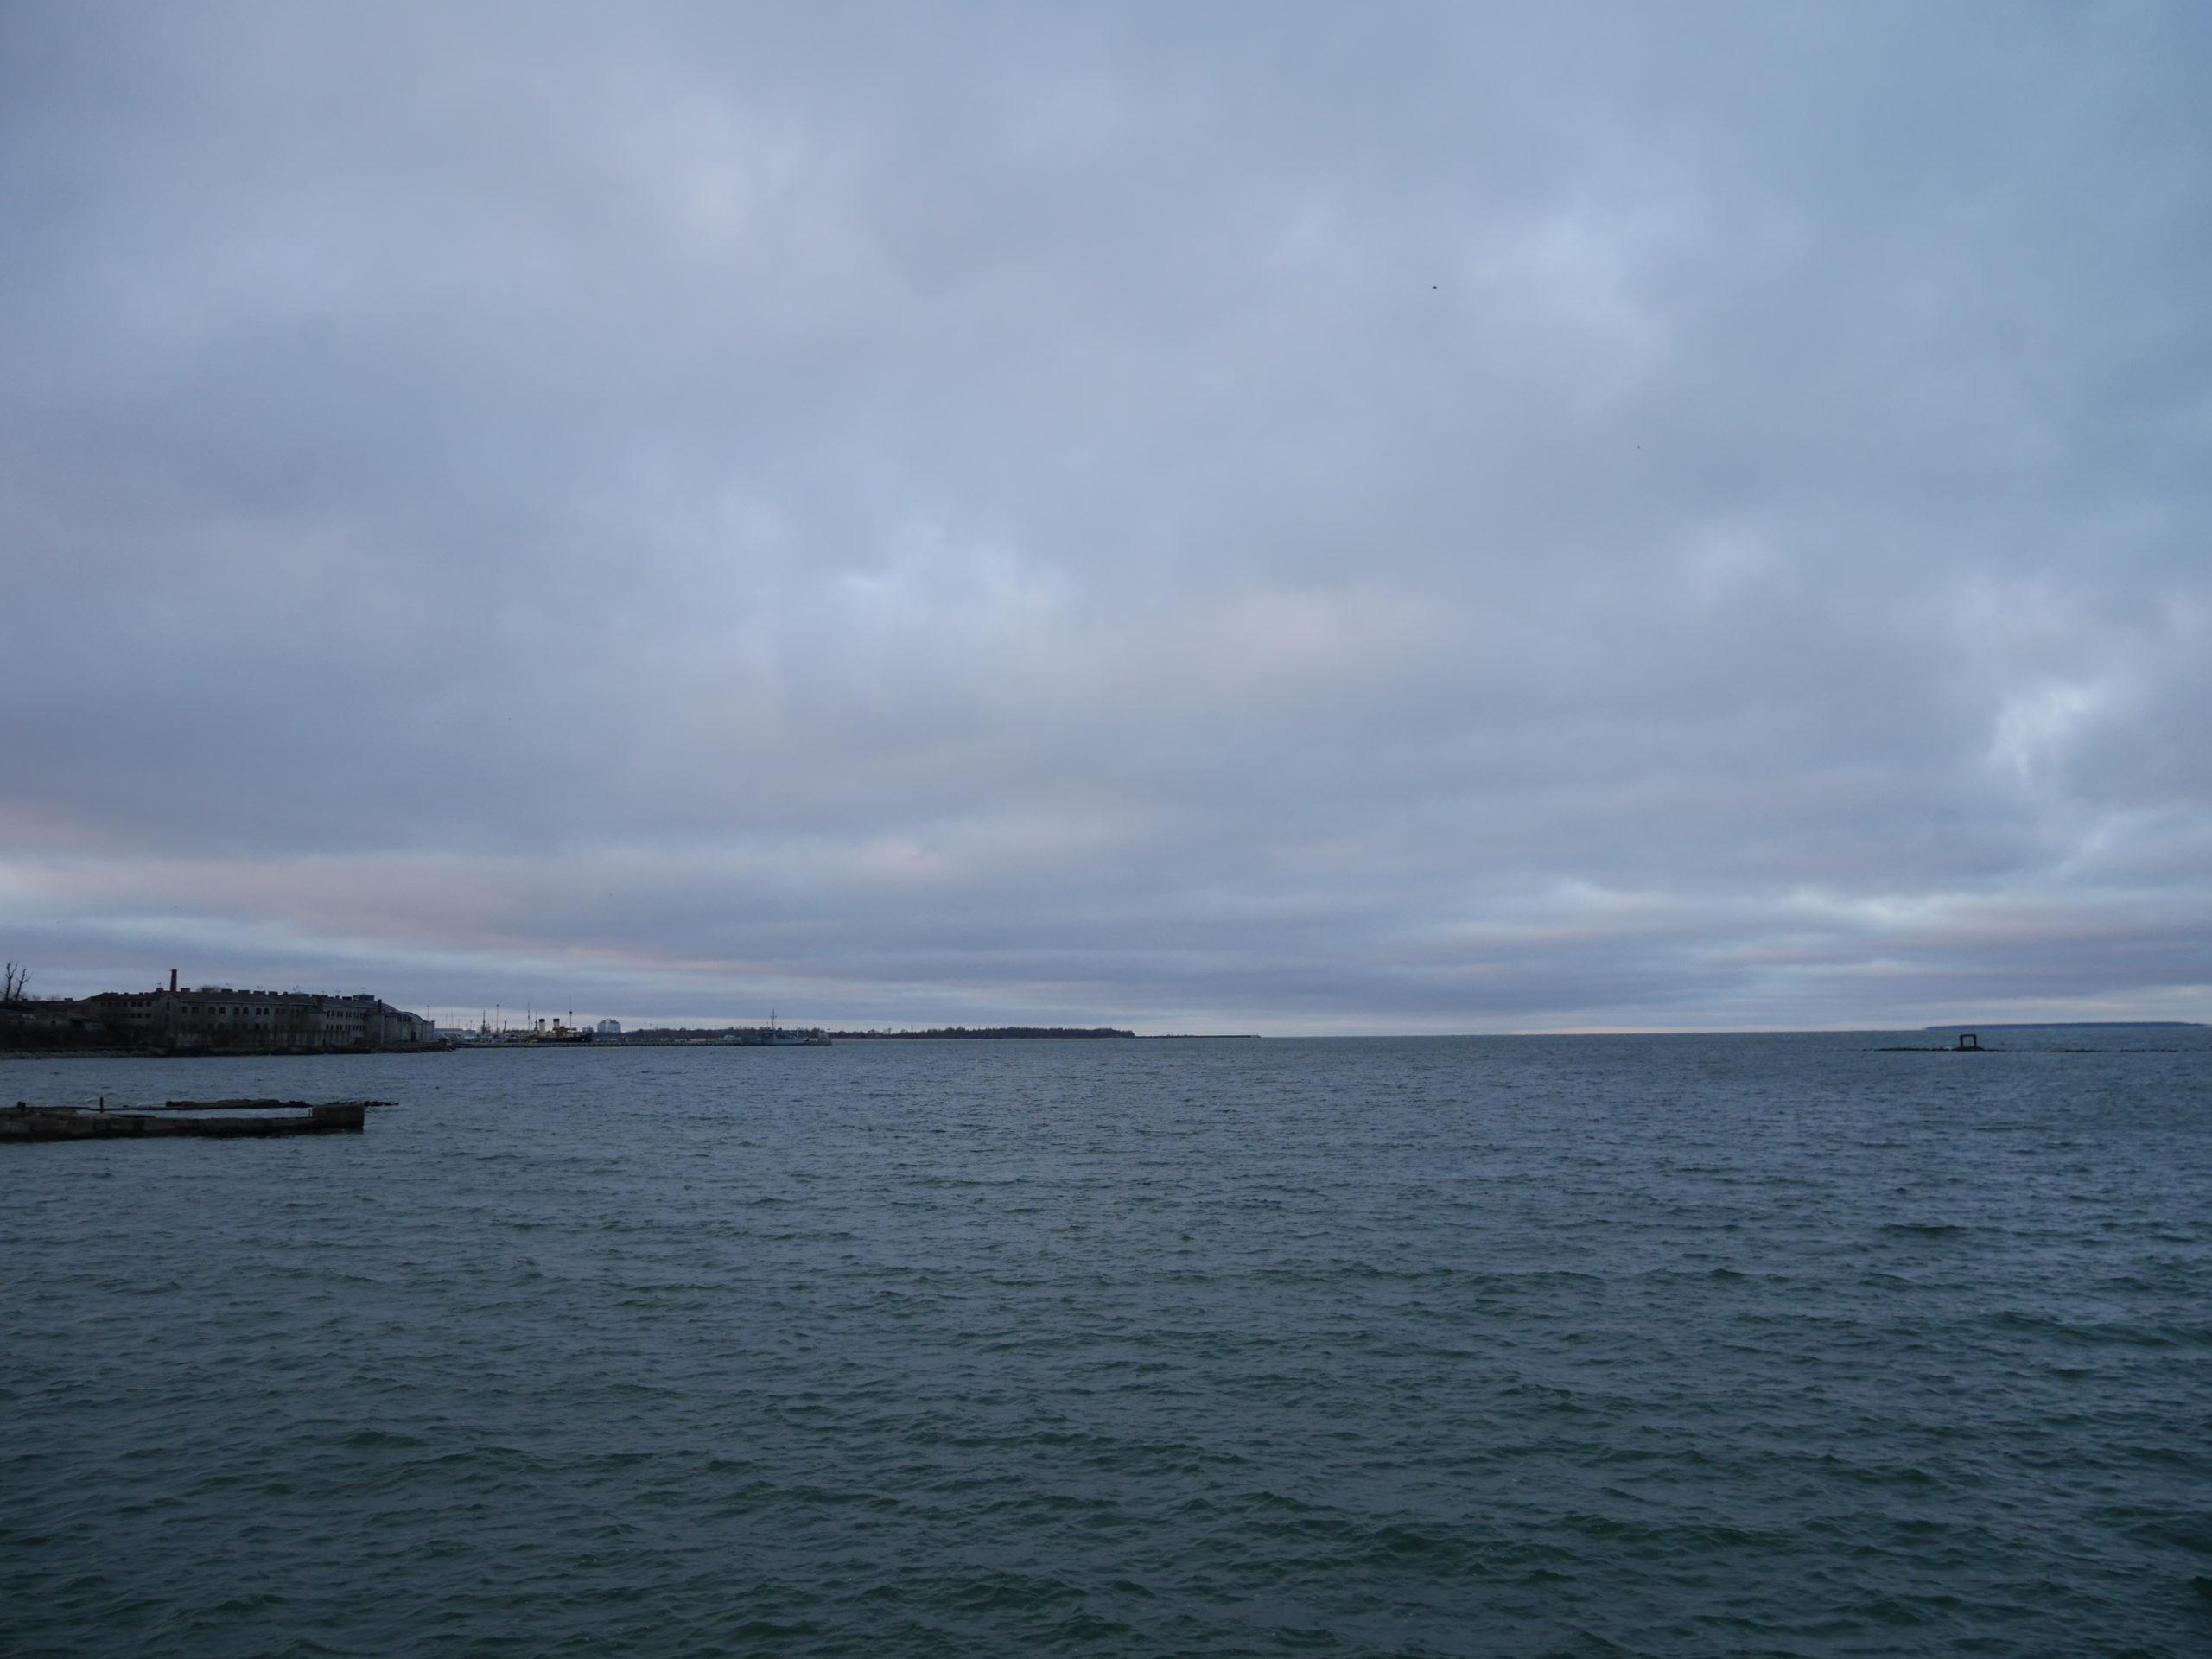 osa fare tre giorni a Tallinn e dintorni sara caulfield